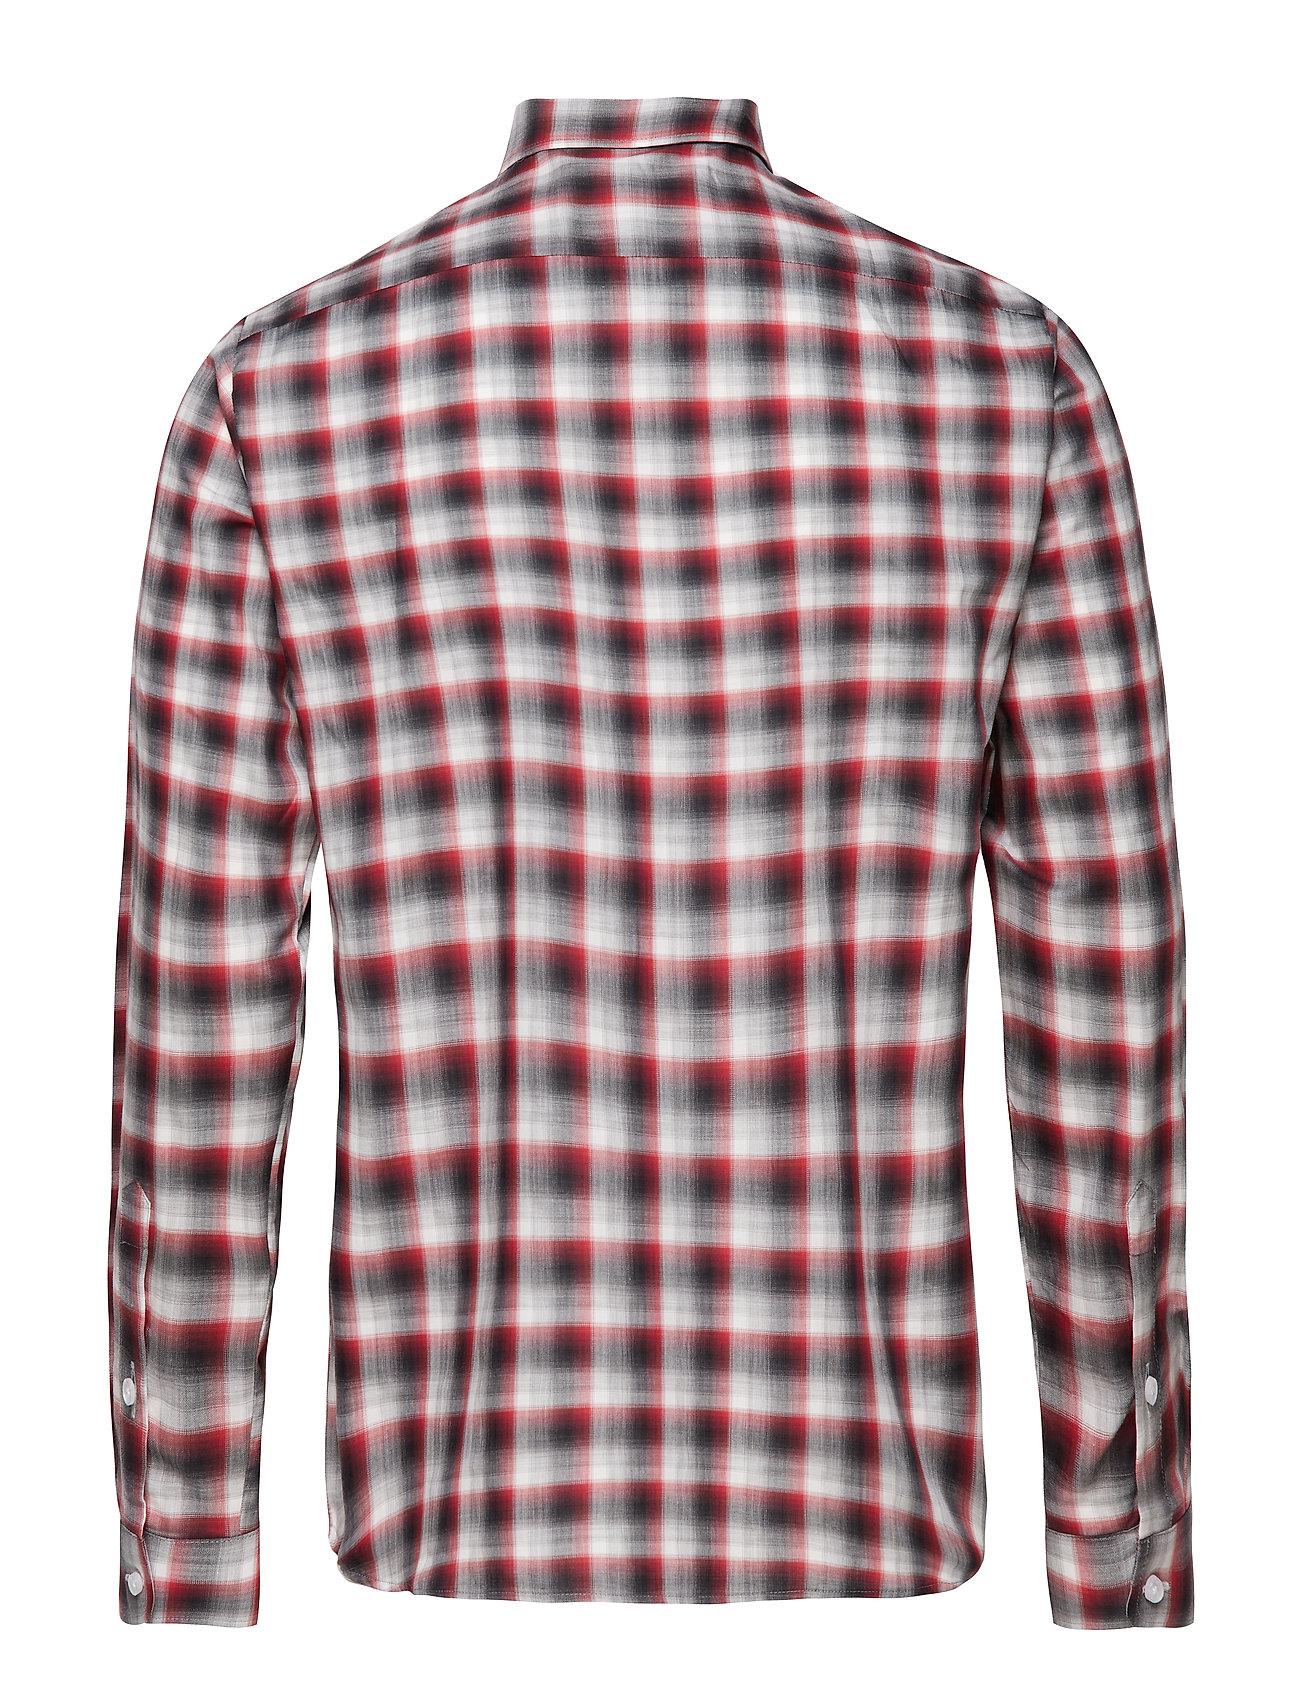 Logocheck With BlurryTonsure Fit Teddy Regular Shirt CsthrQd